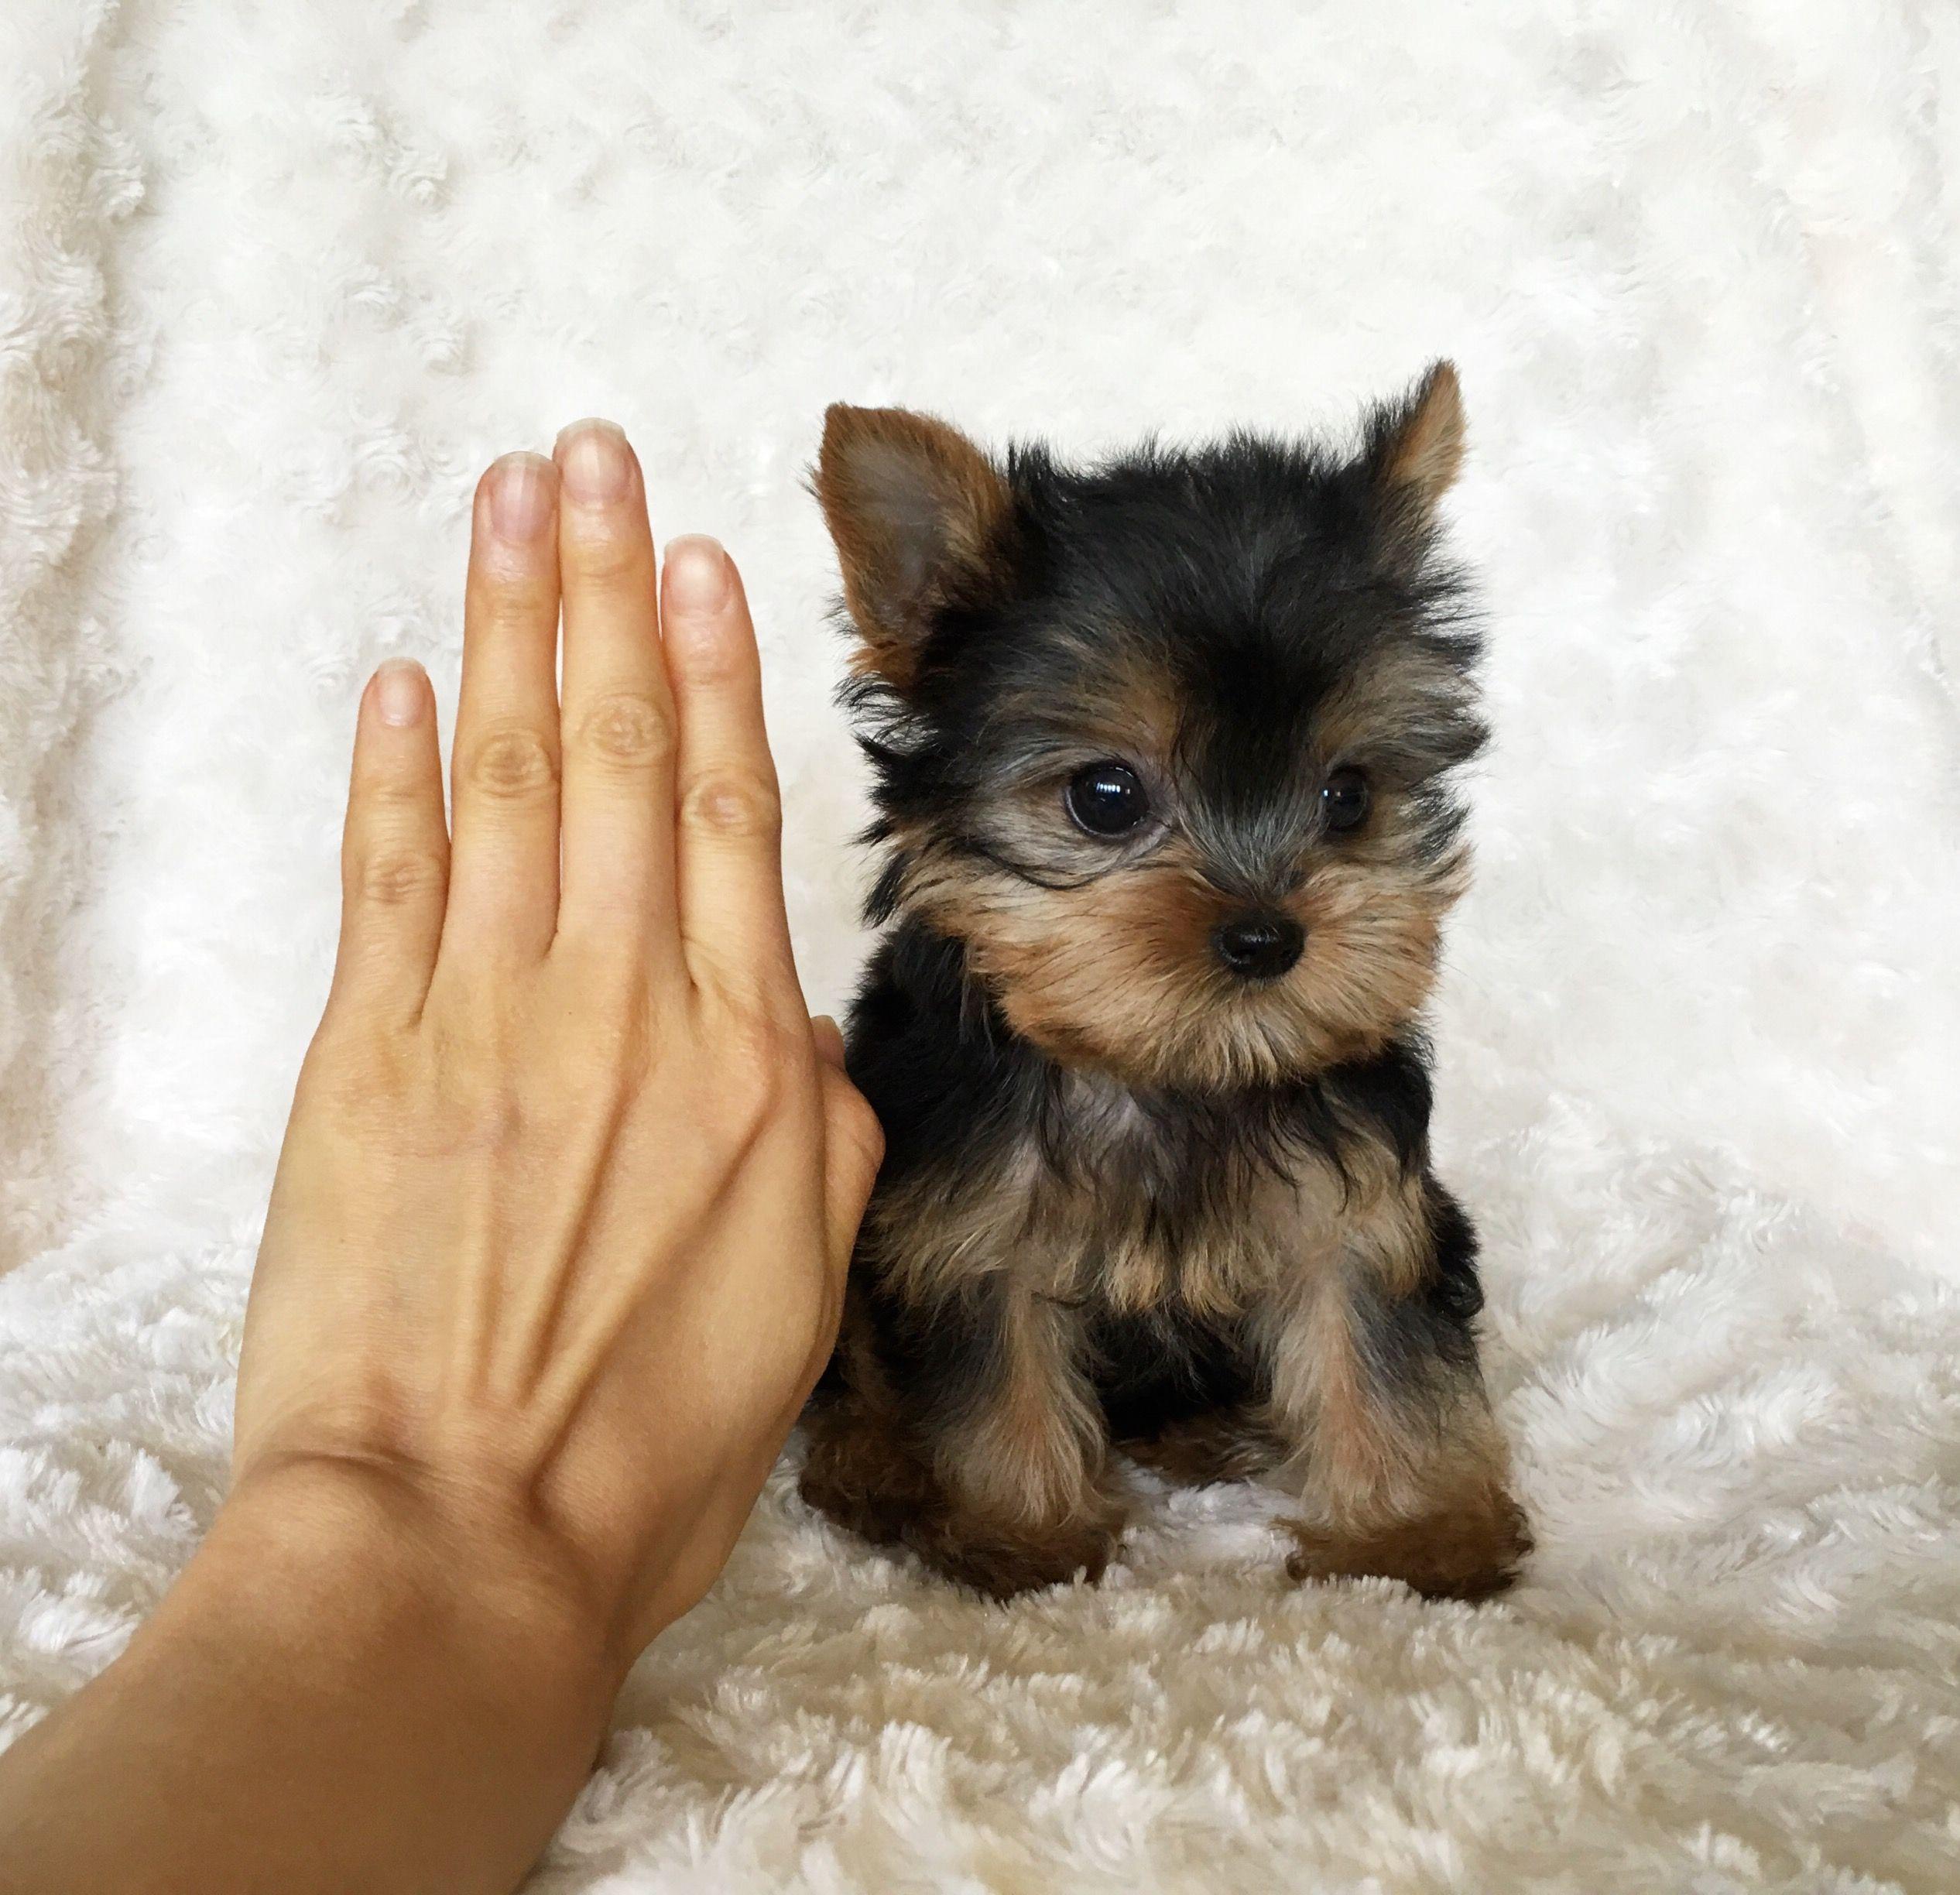 Teacup Yorkie Puppies For Adoption Yorkie Puppies For Adoption Teacup Yorkie Puppy Puppy Adoption